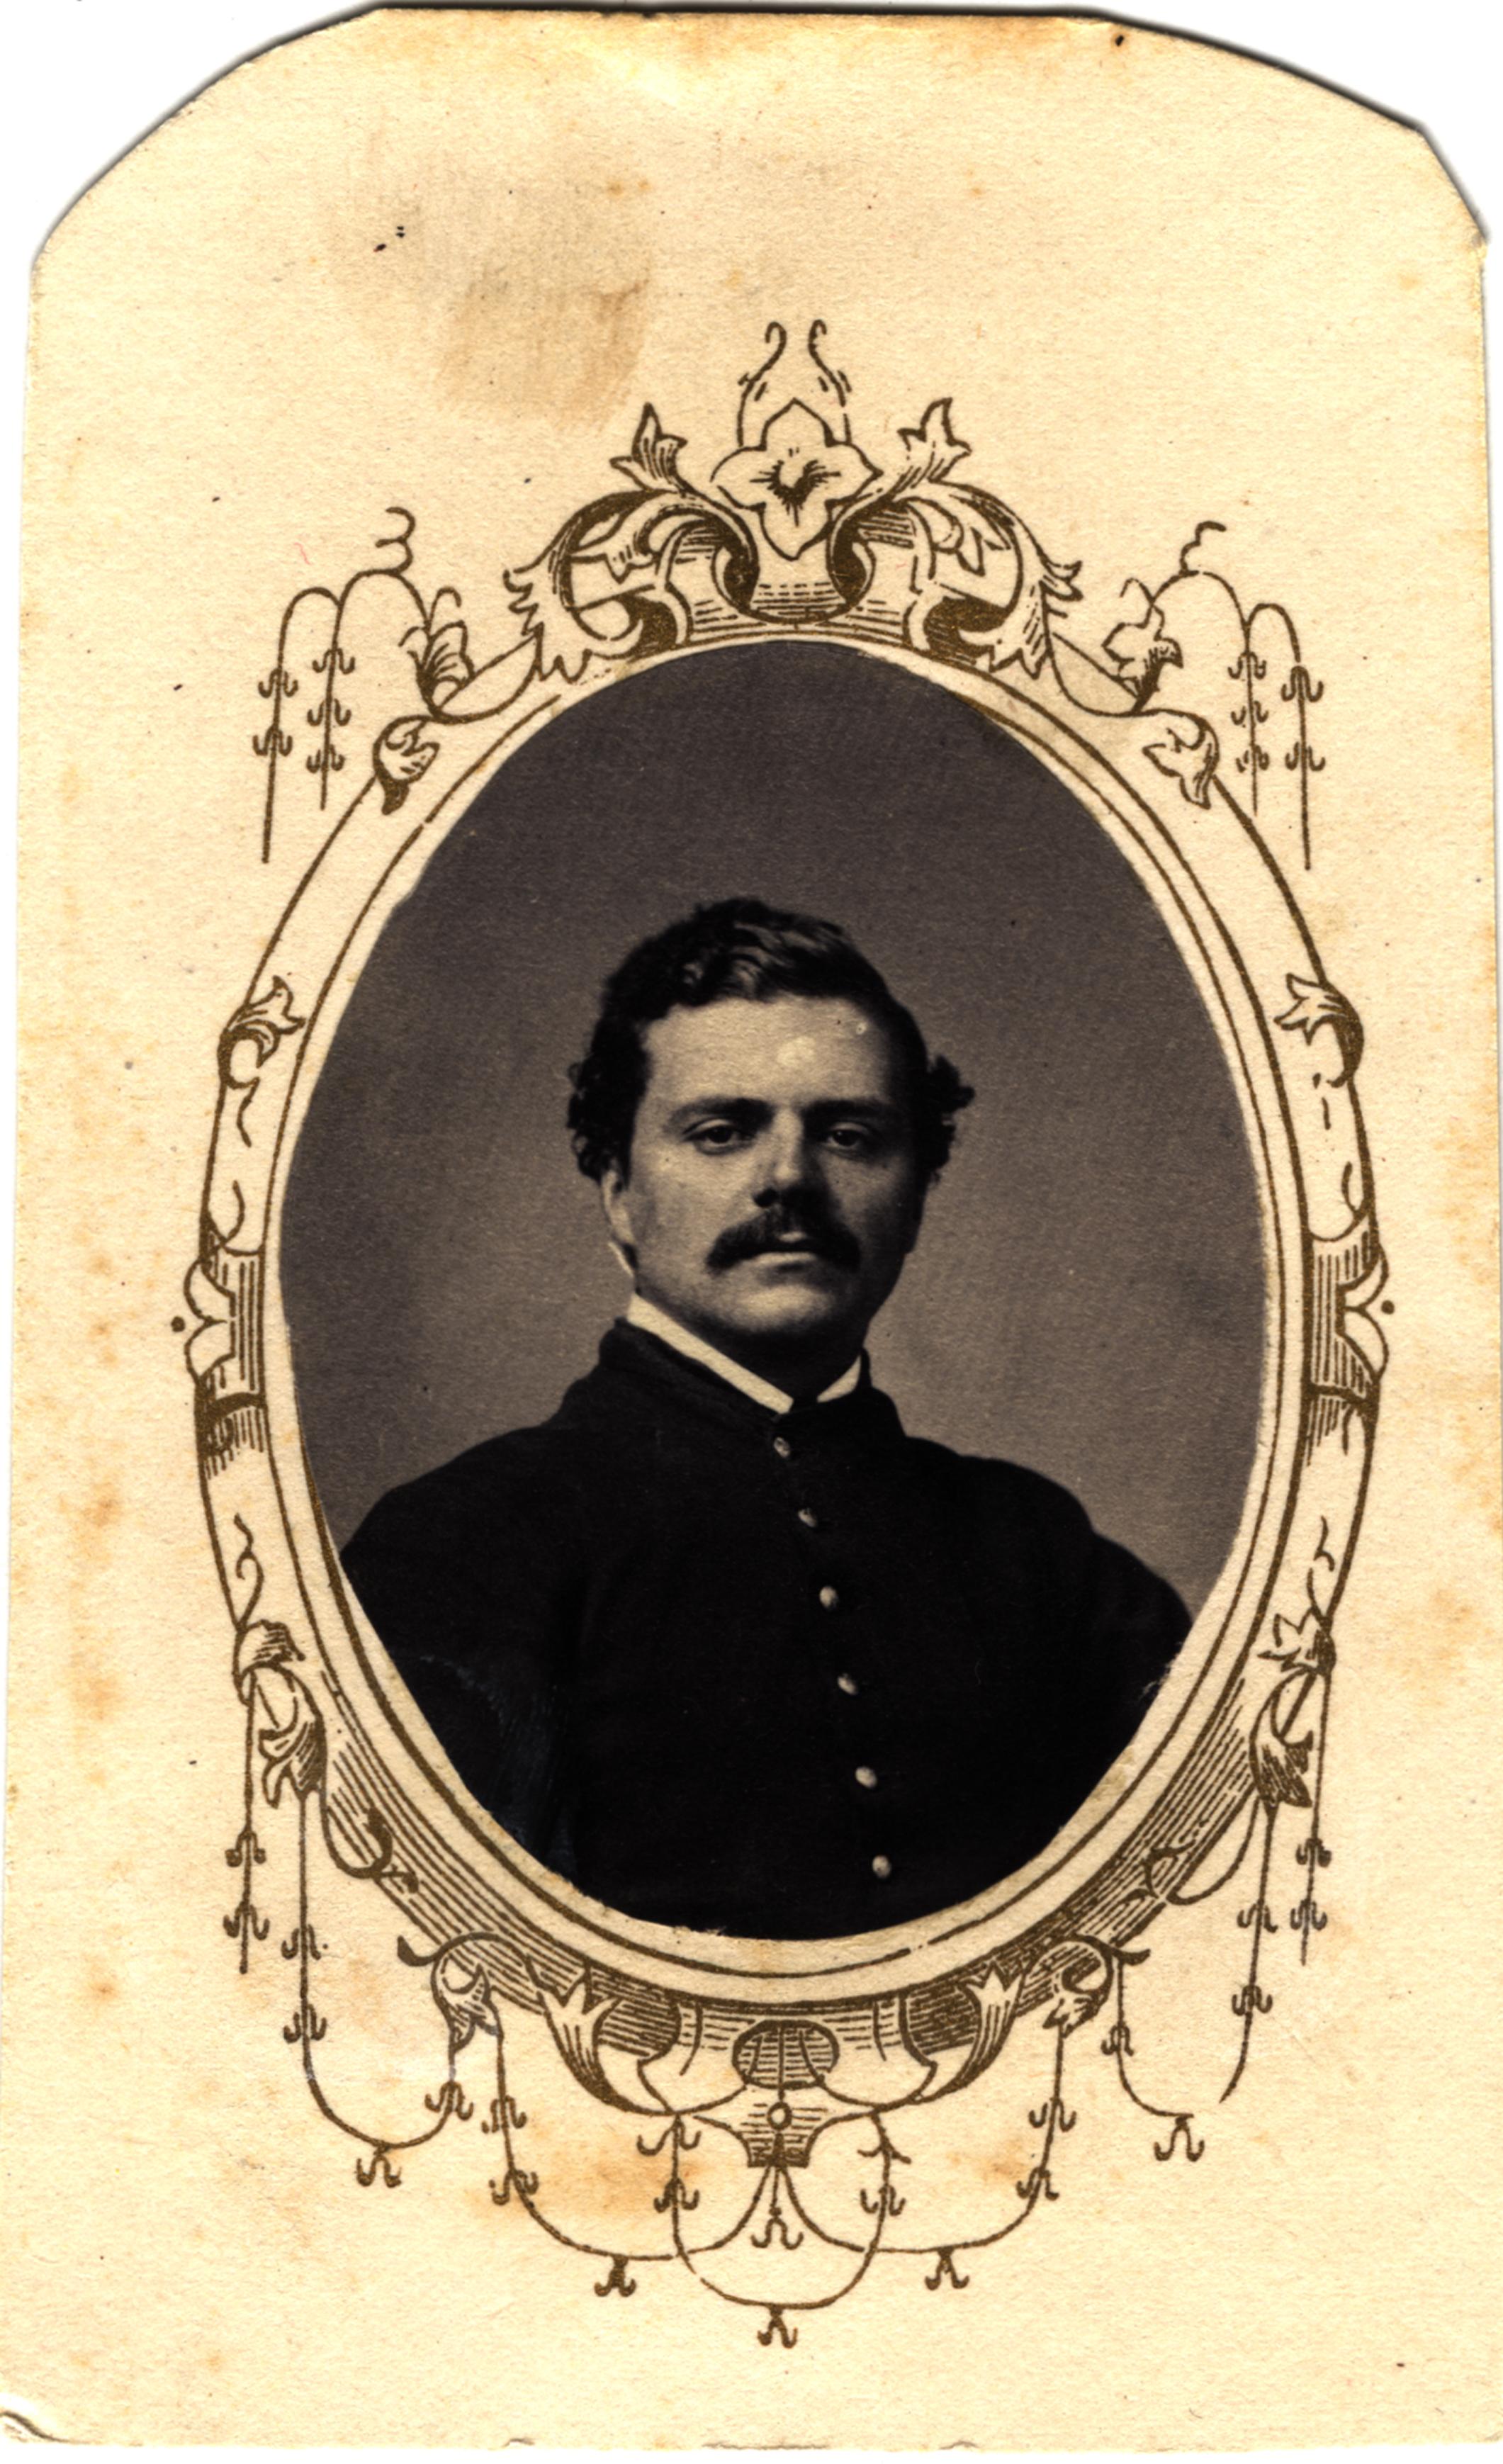 Alfred Kent, circa 1860s